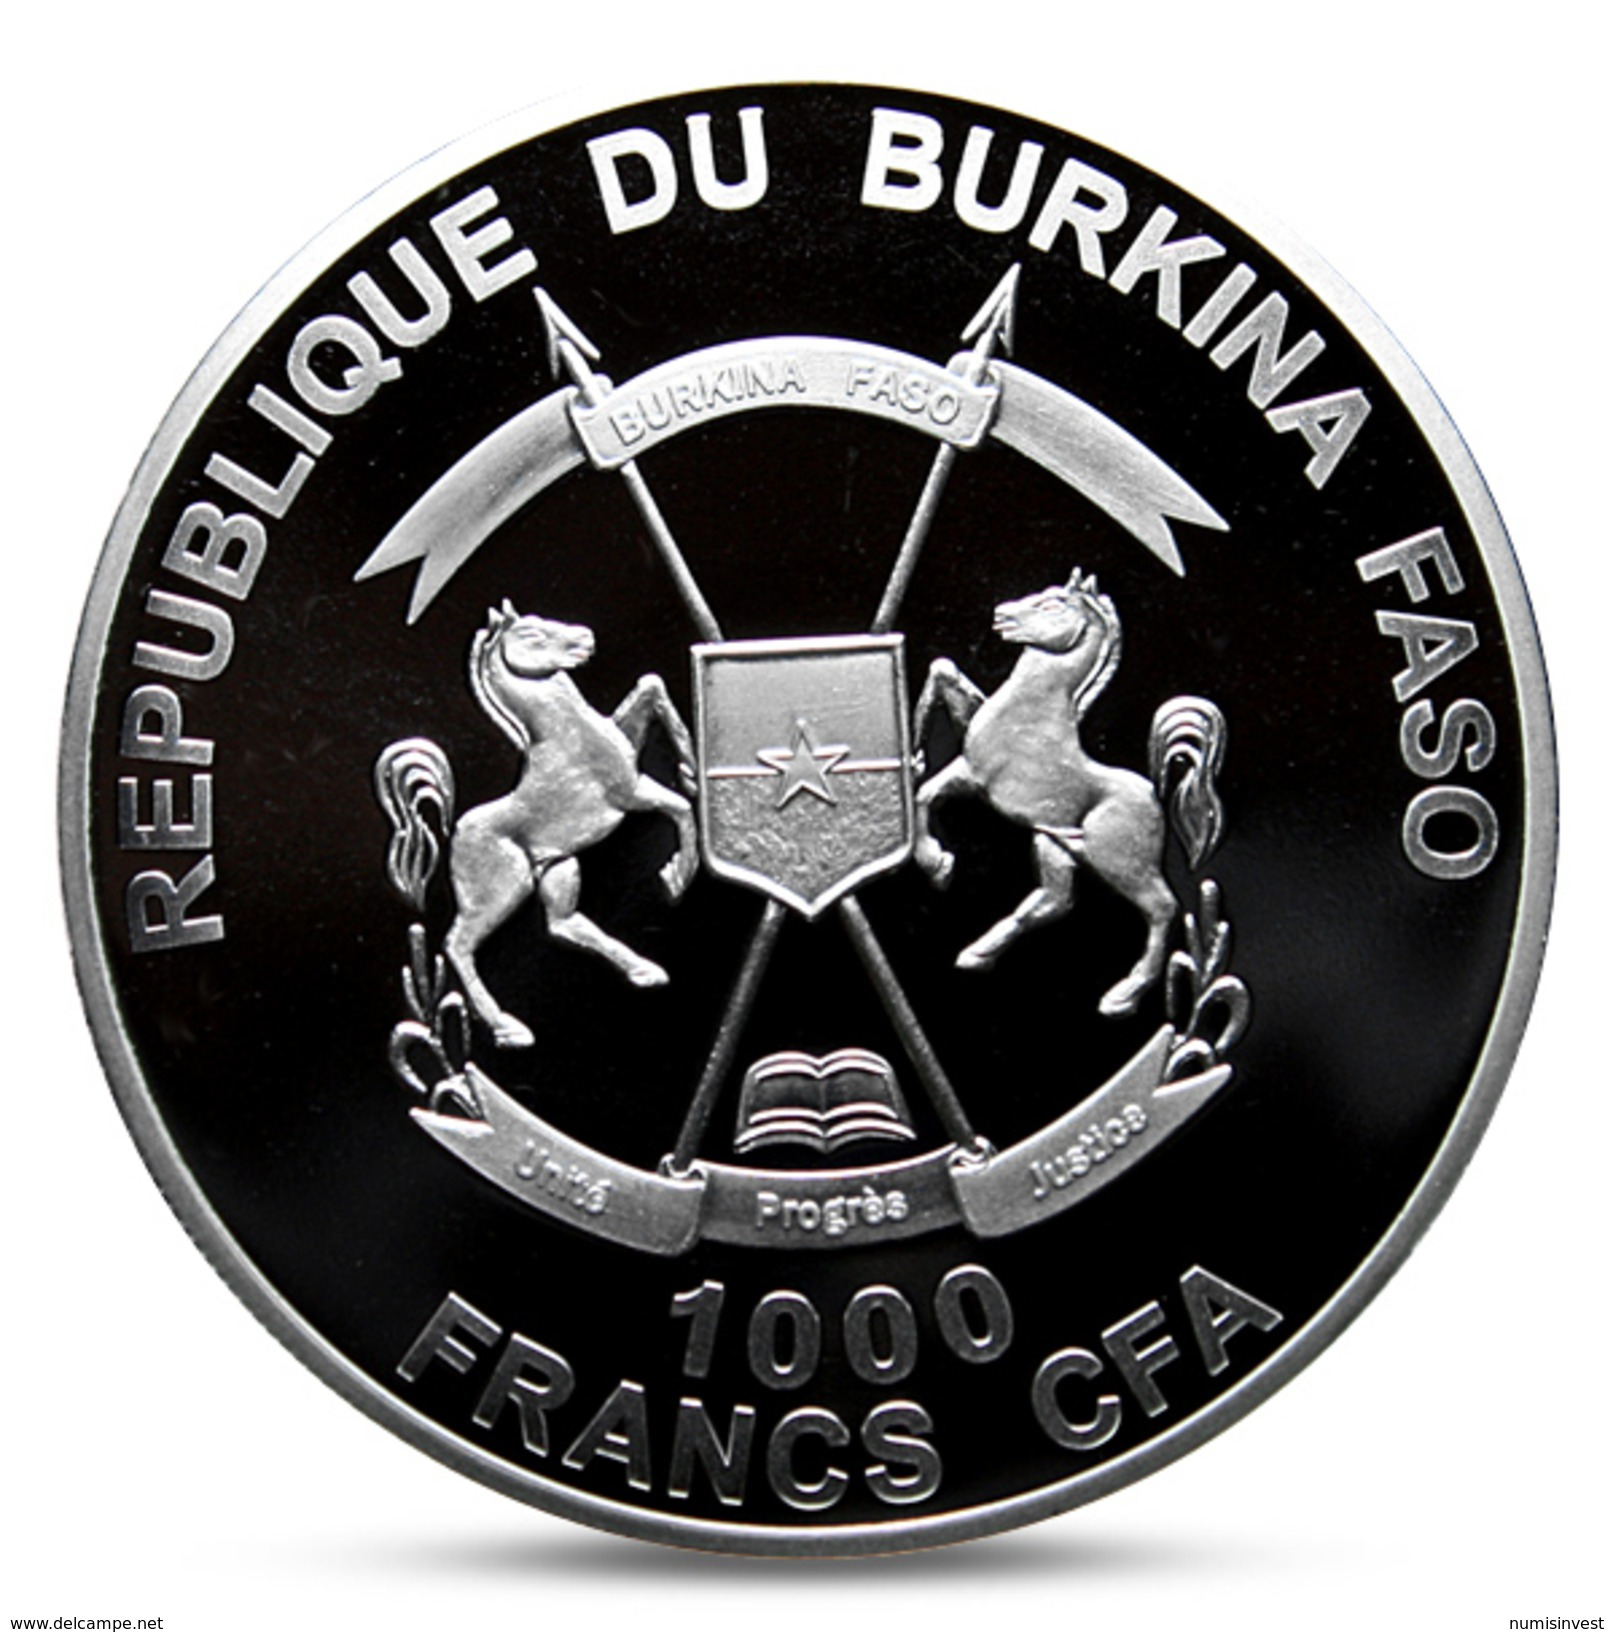 BURKINA FACO 1000 FRANCS FRA CROCODILE ANIMALS SILVER 2016 PROOF - Burkina Faso